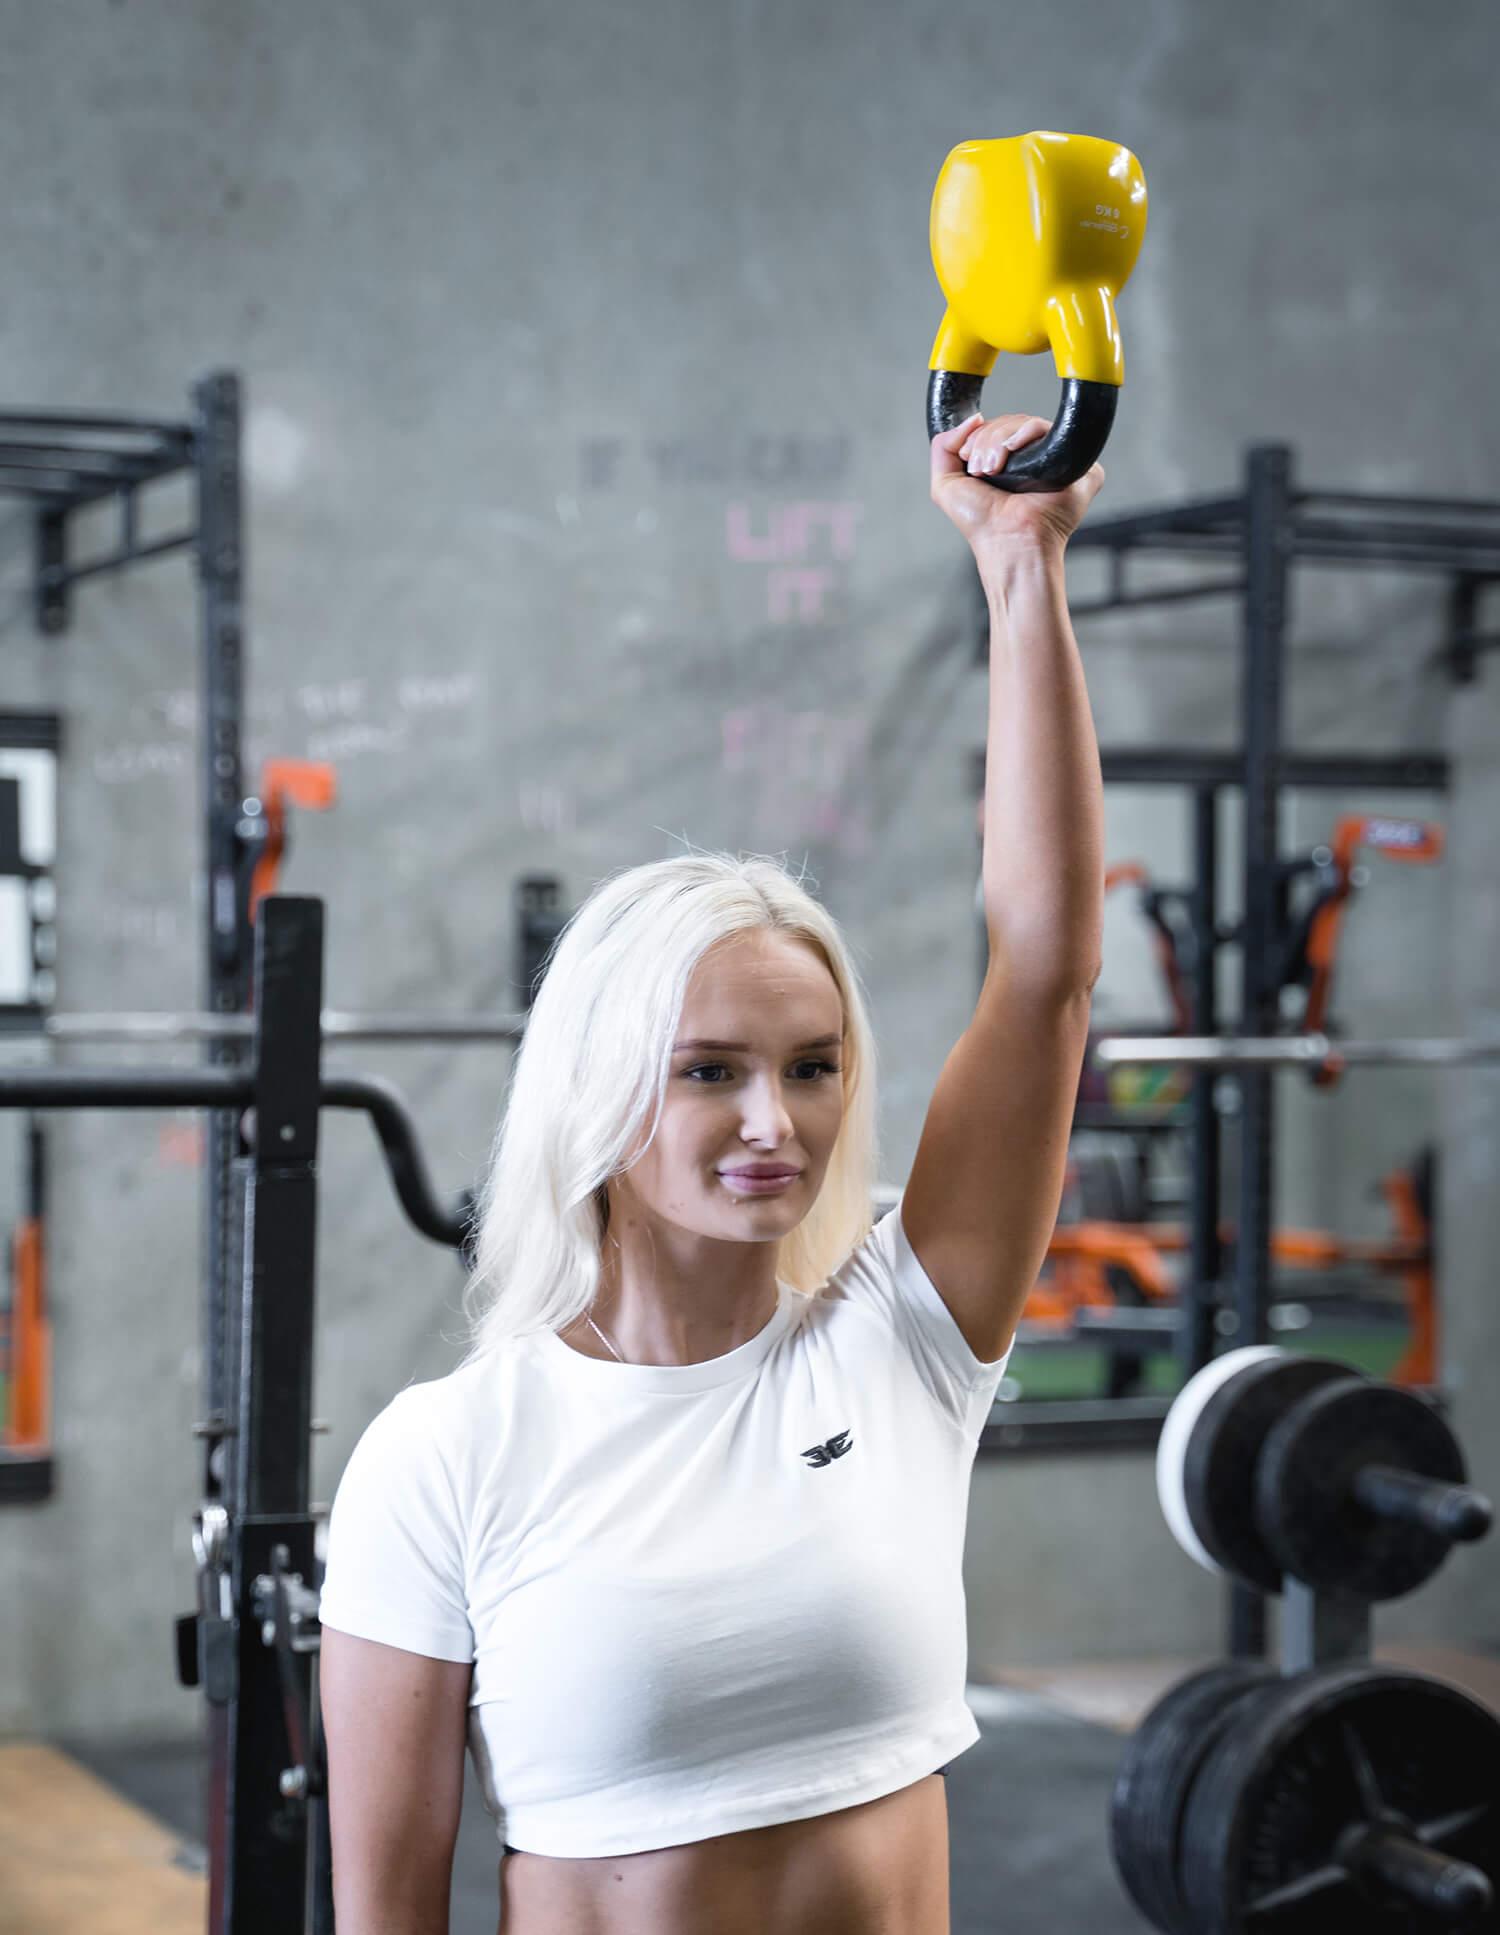 Exercise Rehabilitation Geelong - Motus Health Group